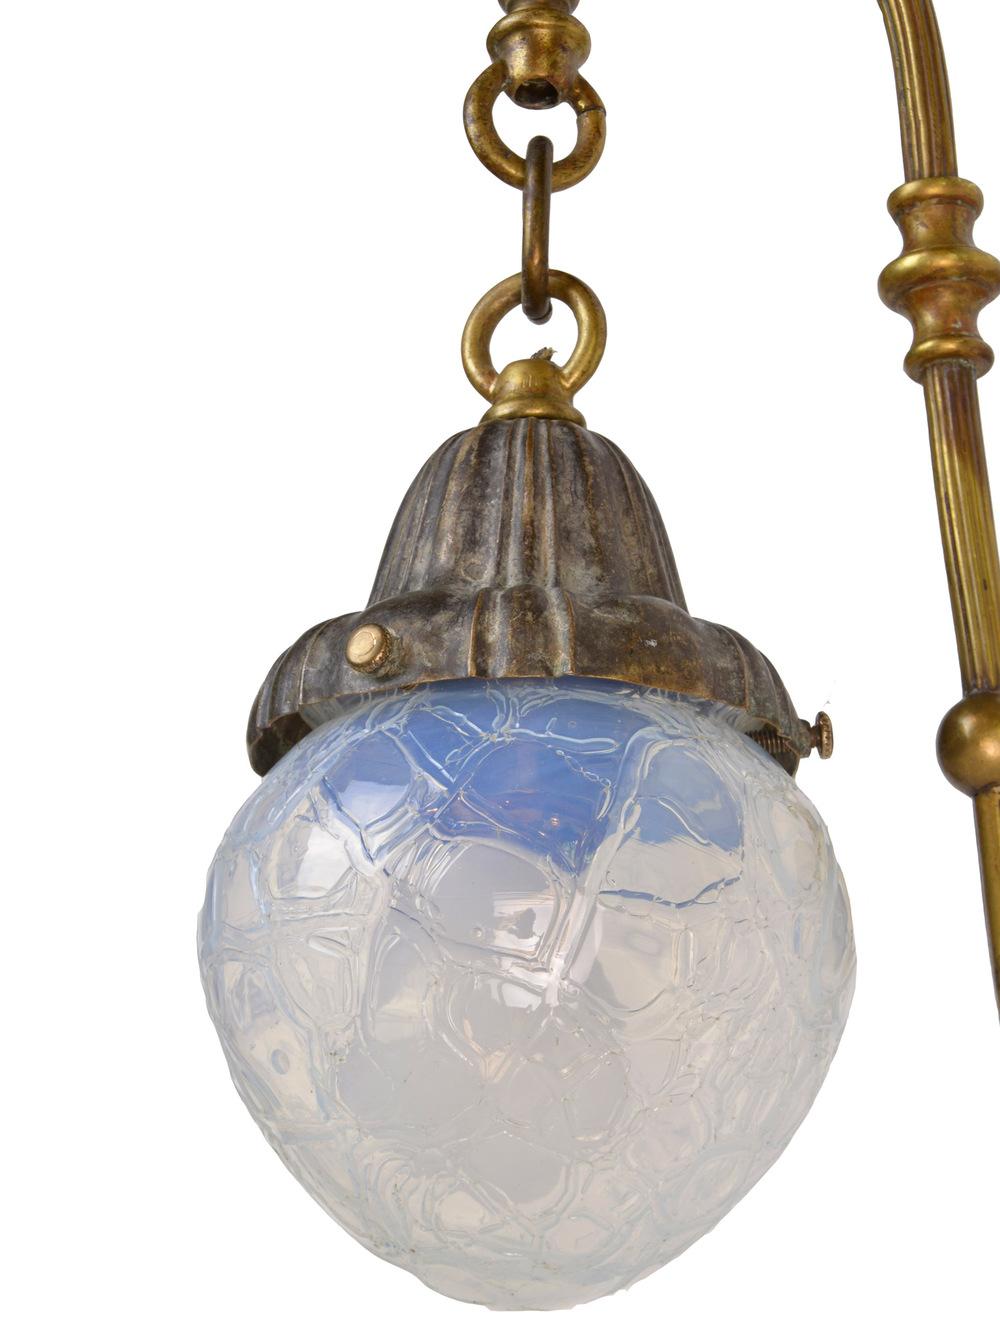 46287-Art-Noveau-Brass-Sconce-with-Vasaline-Shades-Light.jpg